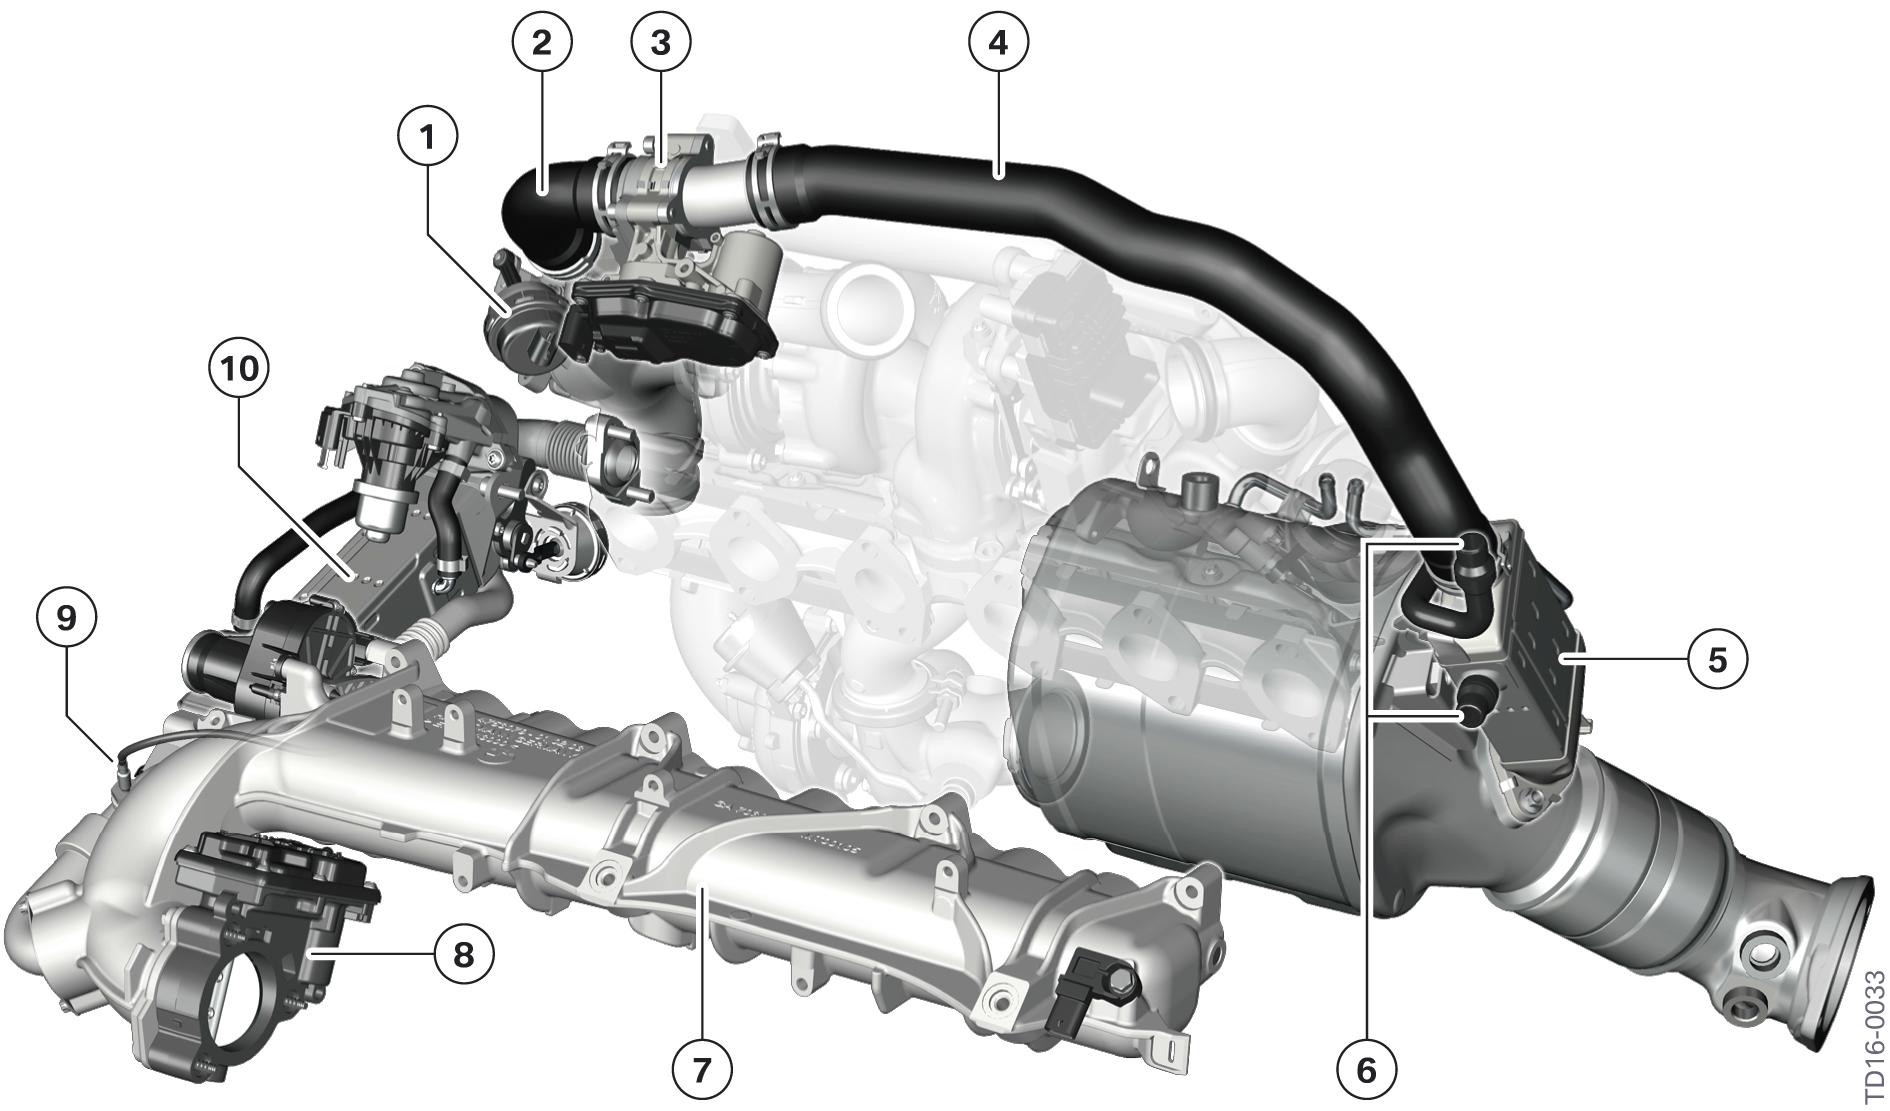 Complexe techniek BMW Quadturbo B57 Super-diesel - AMT